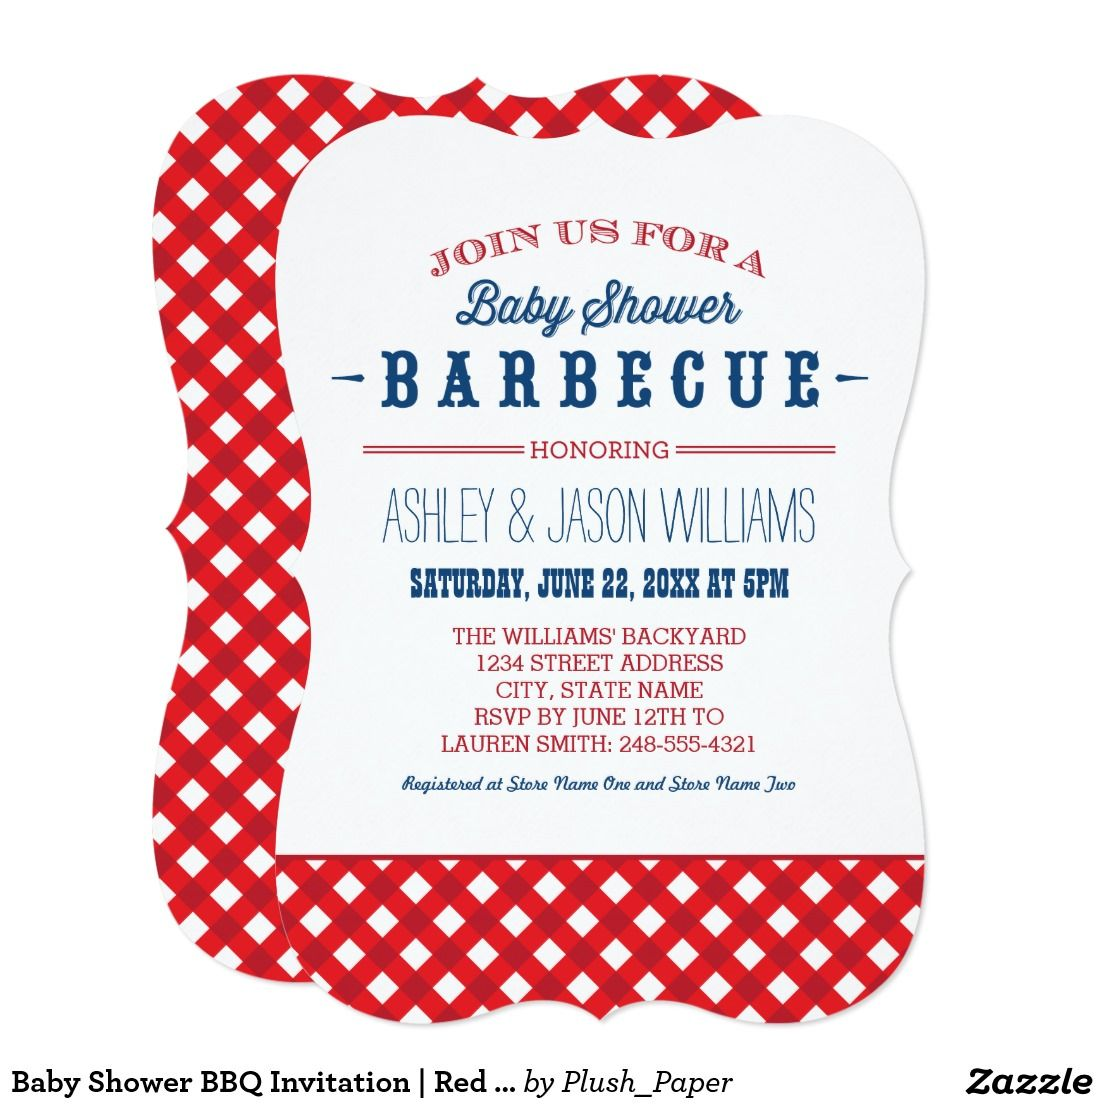 Baby Shower BBQ Invitation | Red White + Blue